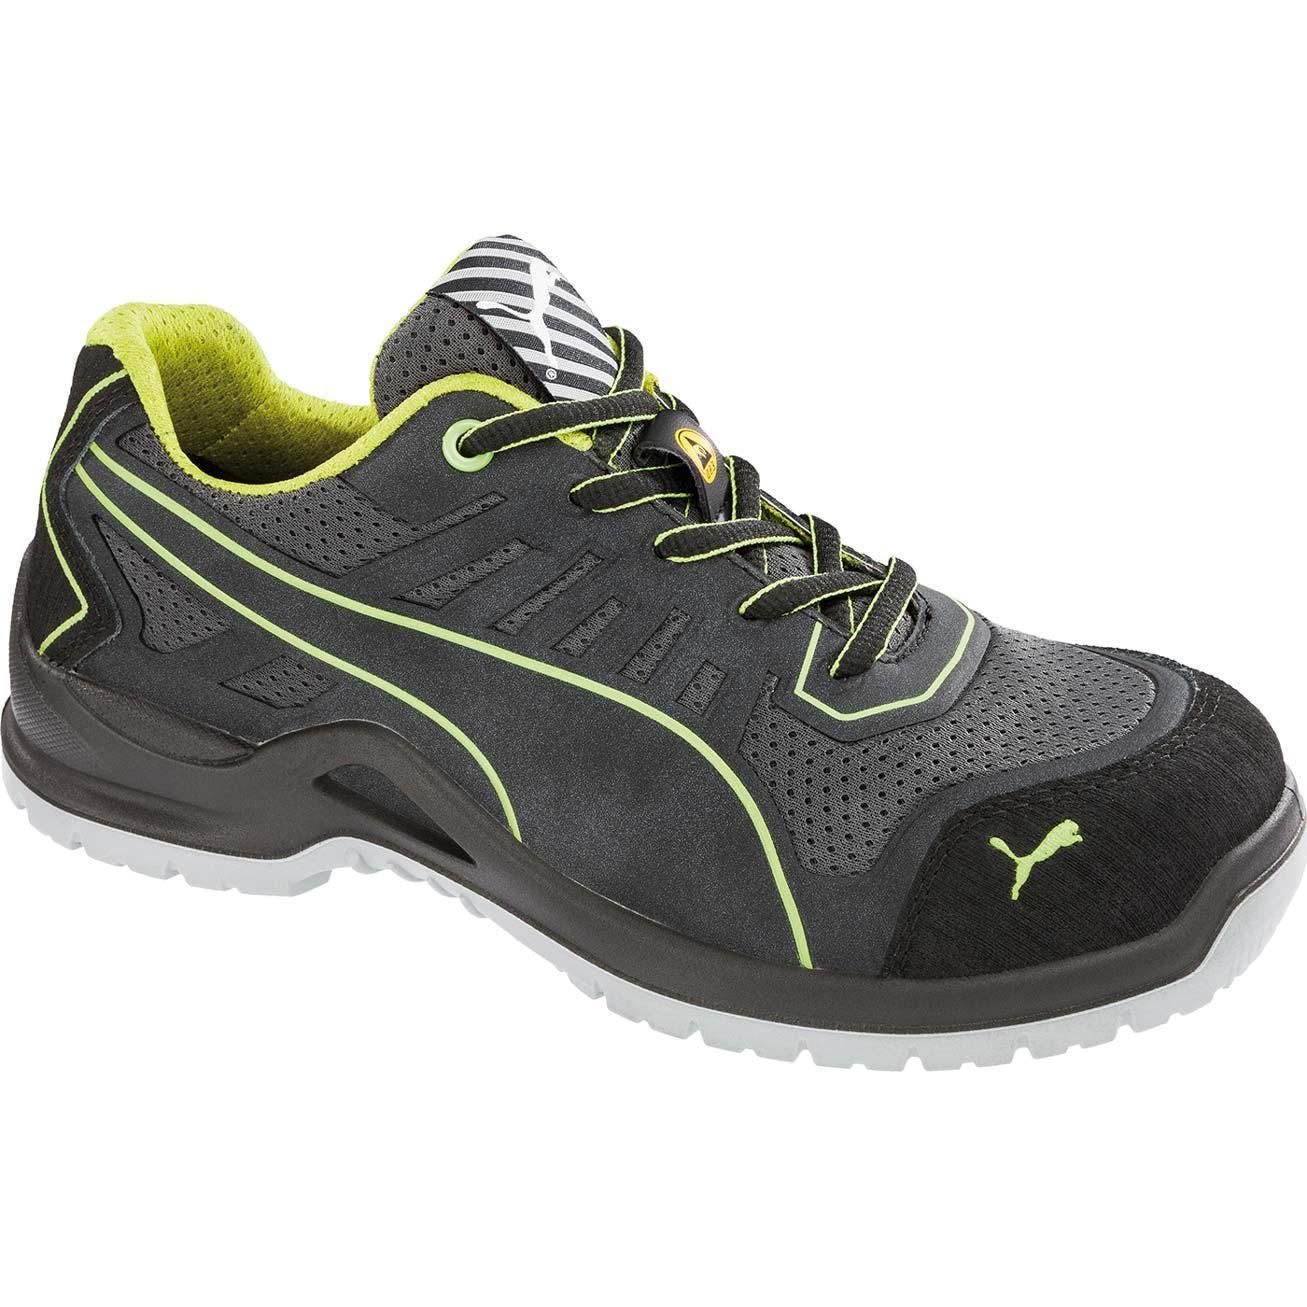 48df3c5ec698 Puma Safety Shoes Womens. Puma Miss Safety Technics Womenu0026 39 s Steel  Toe Static-Dissipative Work Athletic